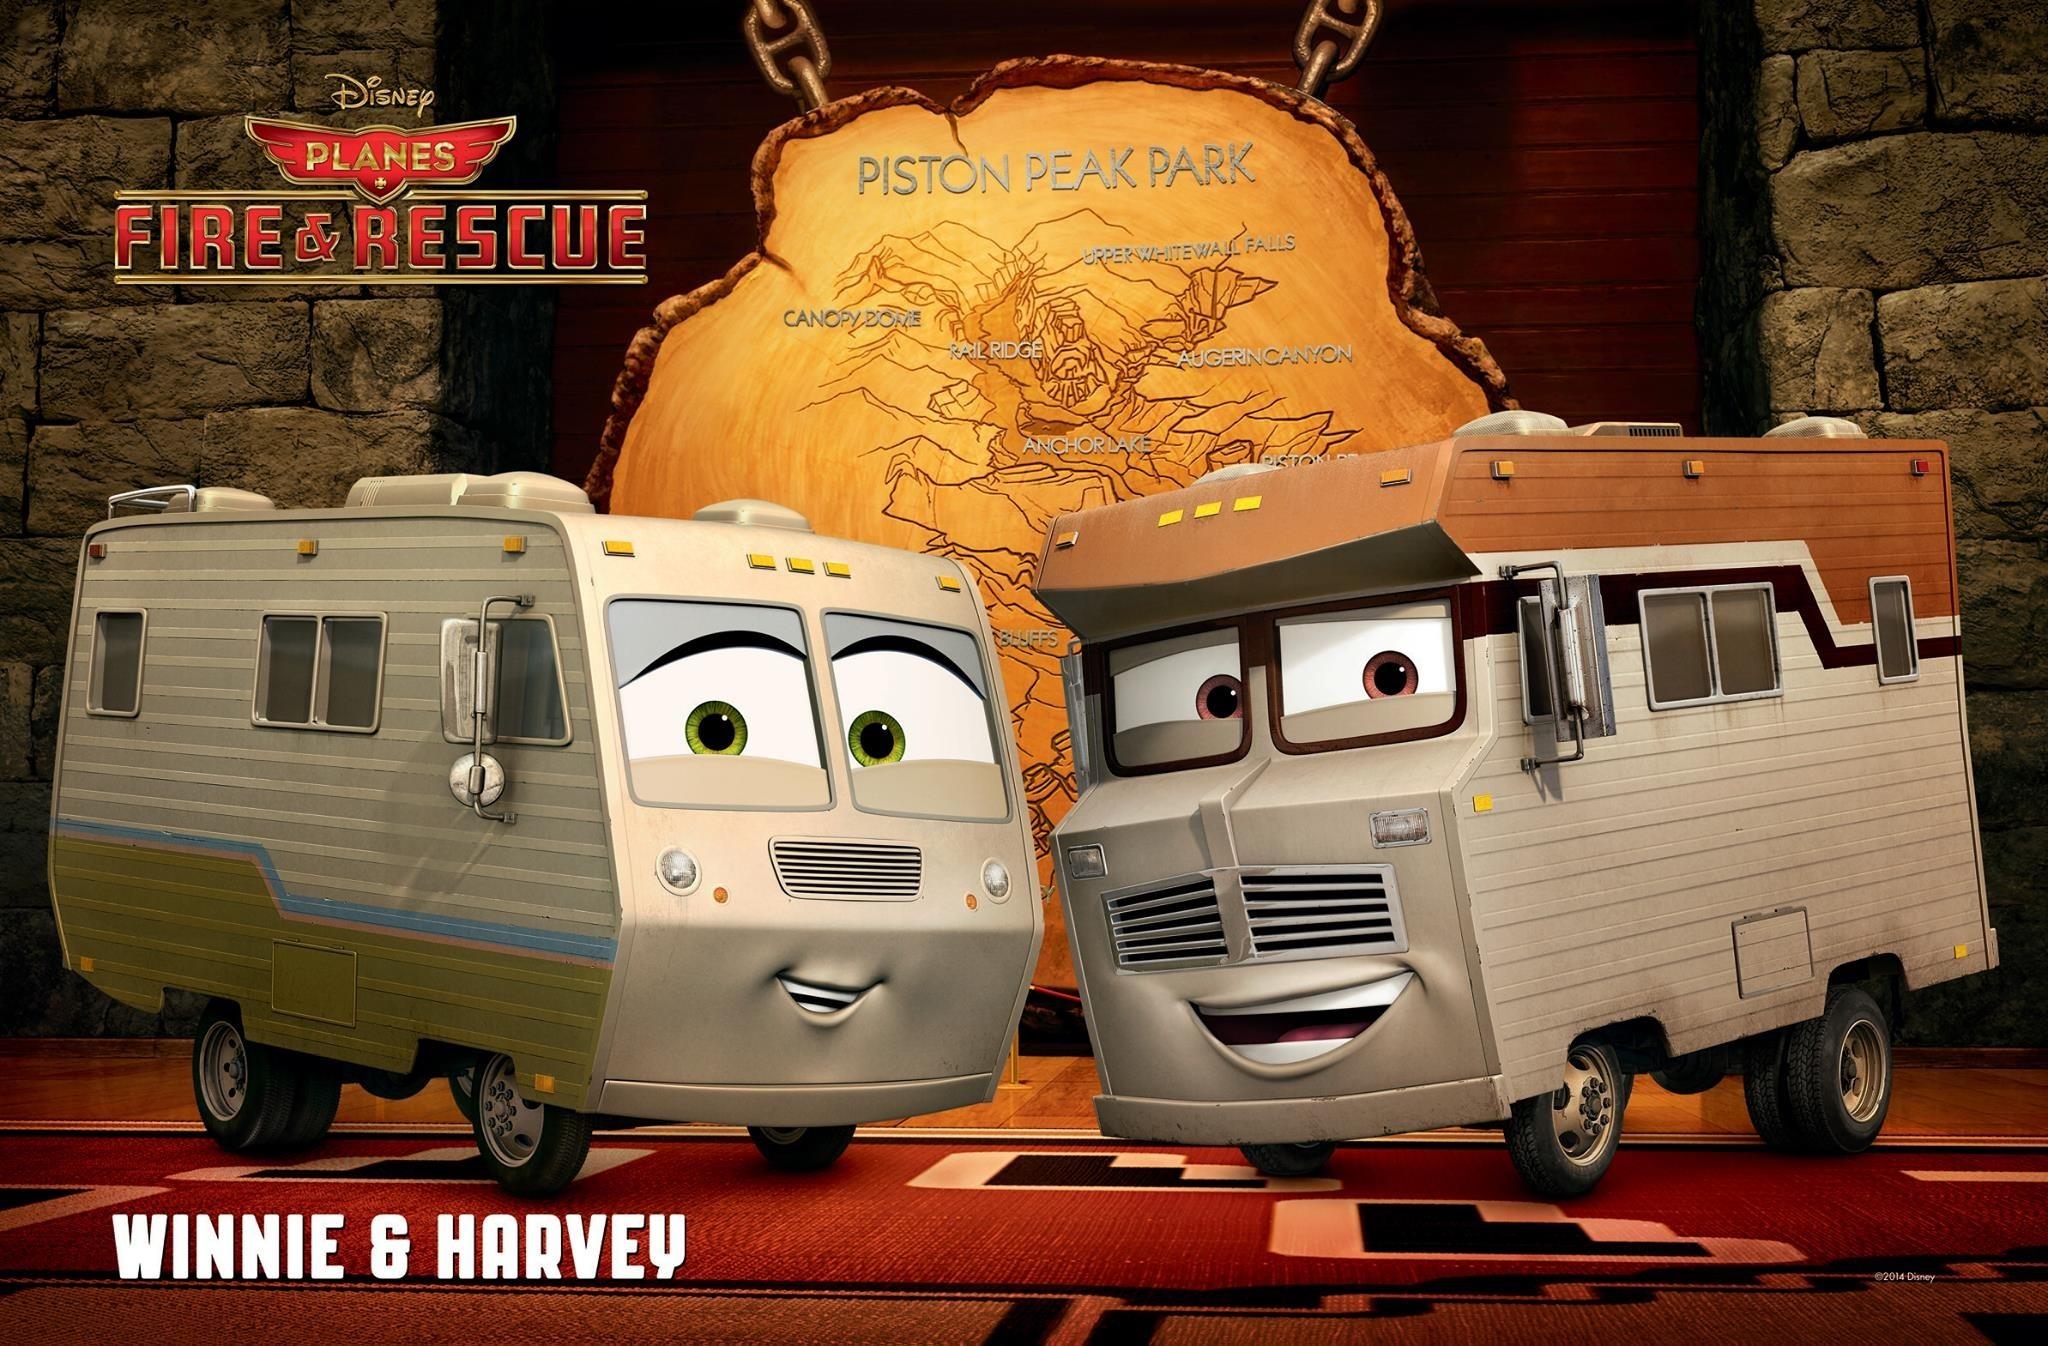 Harvey e Winnie